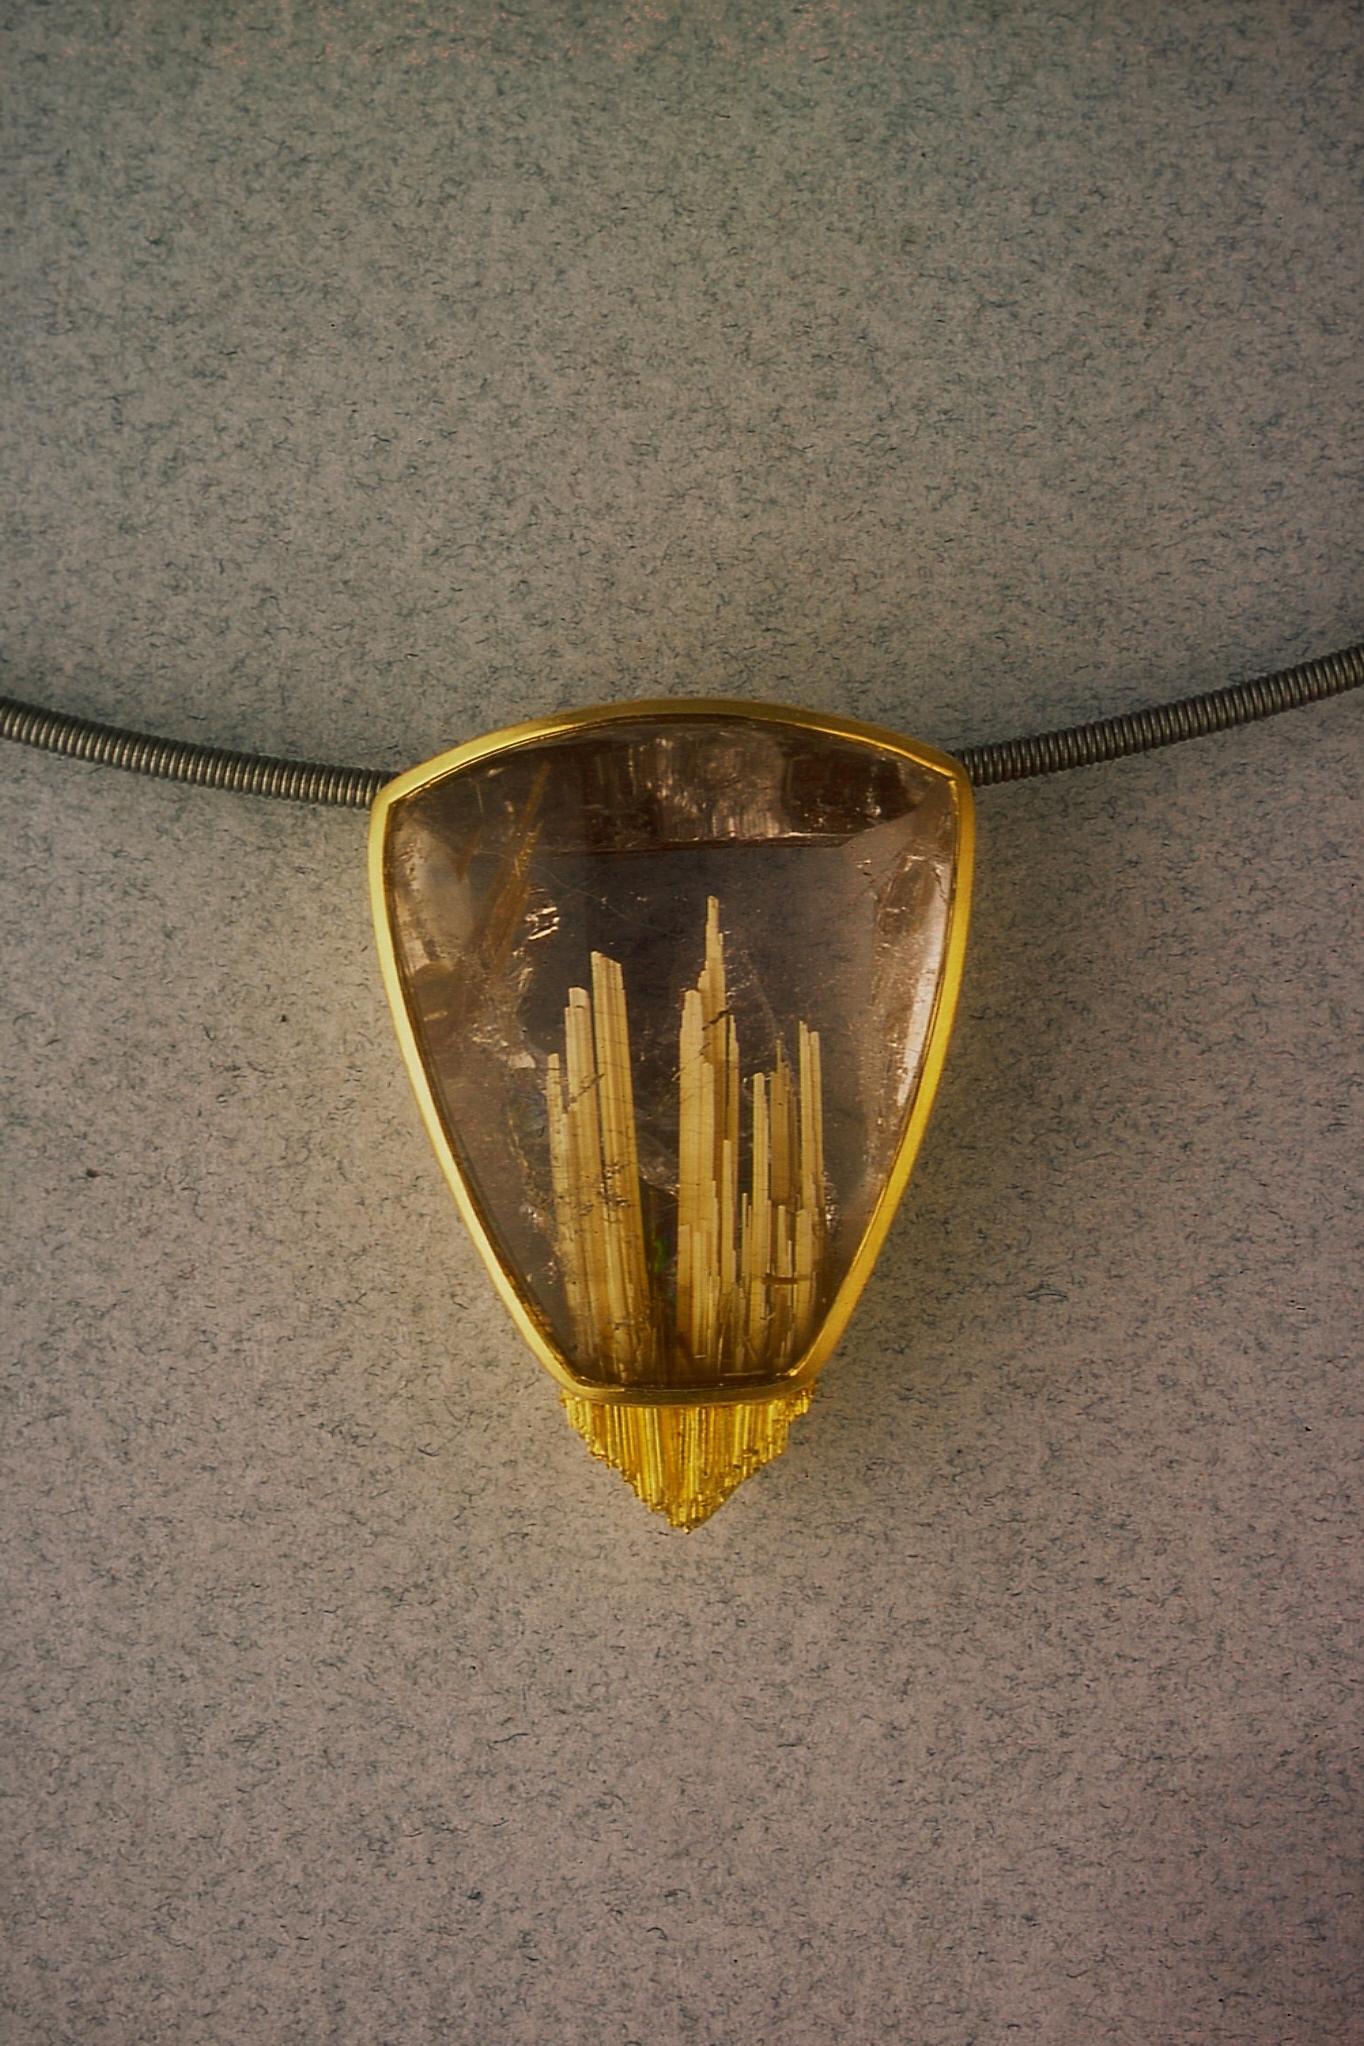 Rutile quartz cabochon, gold 18 & 22 Kt., niobium cable with gold bayonet clasp.